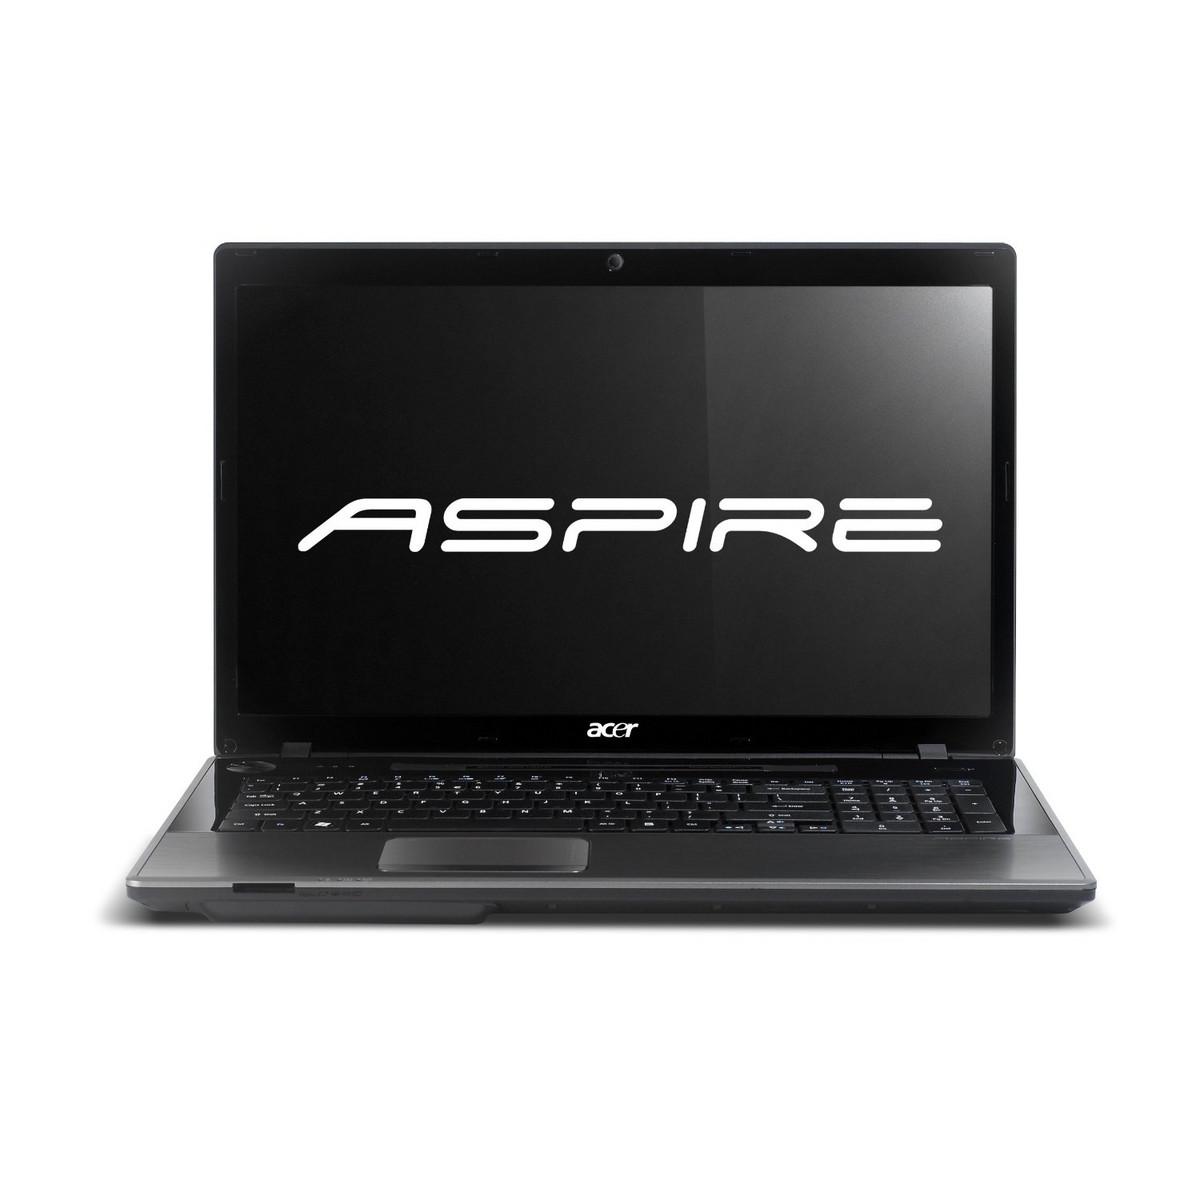 Acer Aspire 7745G Intel Graphics 64 Bit